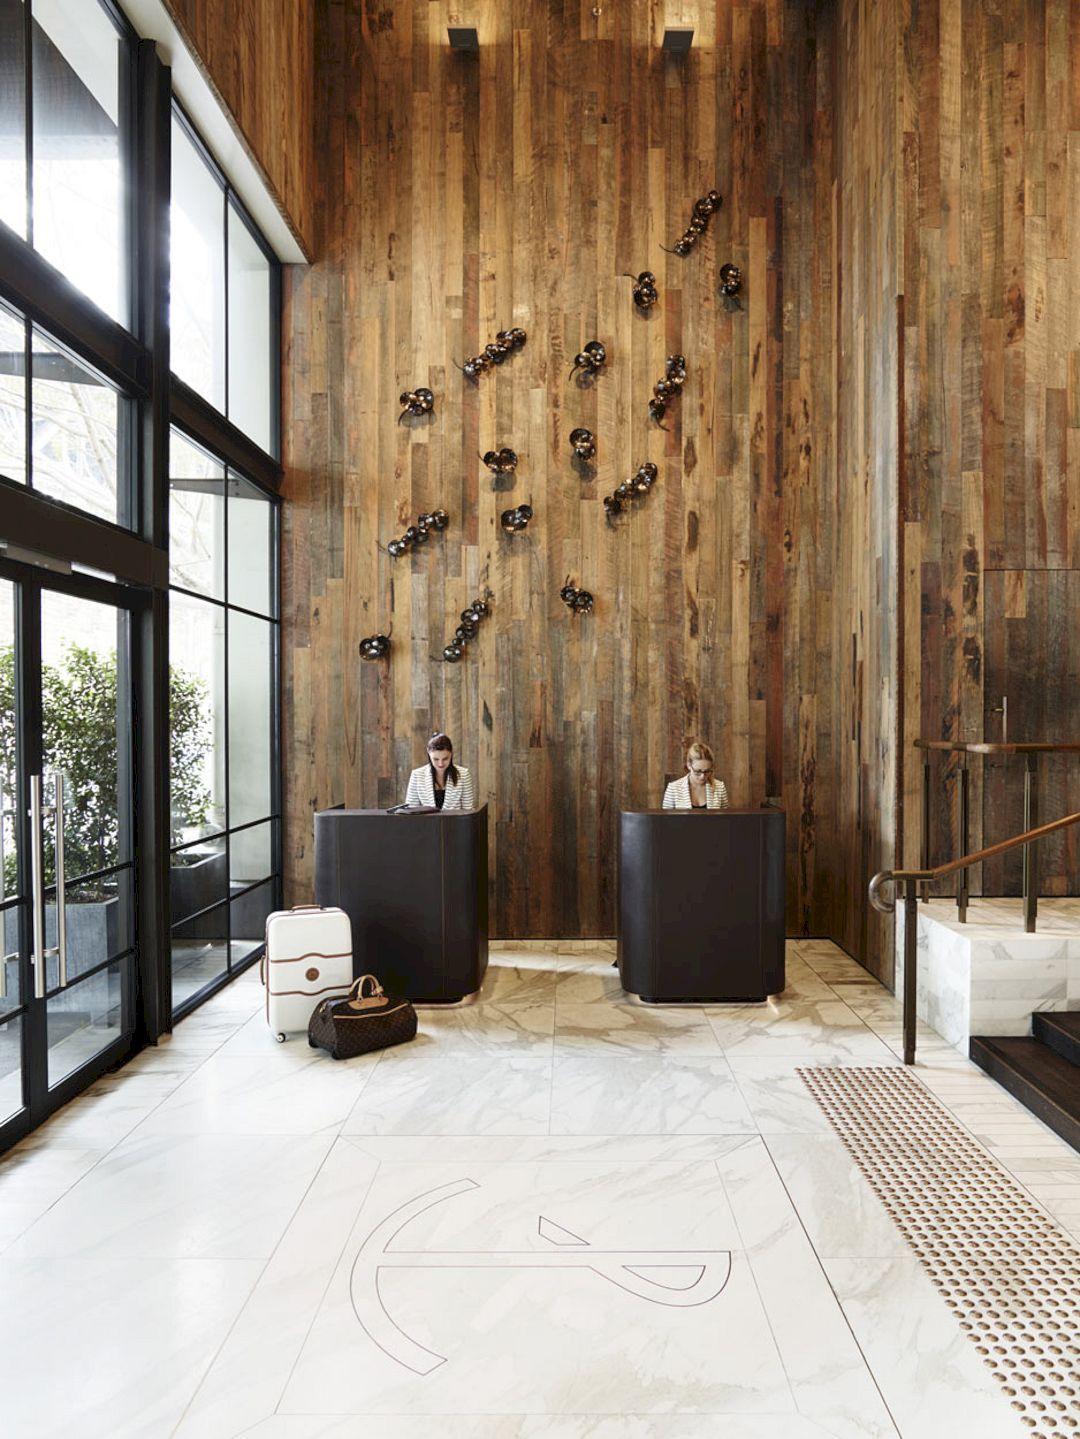 Charmant Best Modern And Gorgeous Office Interior Design Ideas  Https://www.futuristarchitecture.com/23070 Office Interior.html